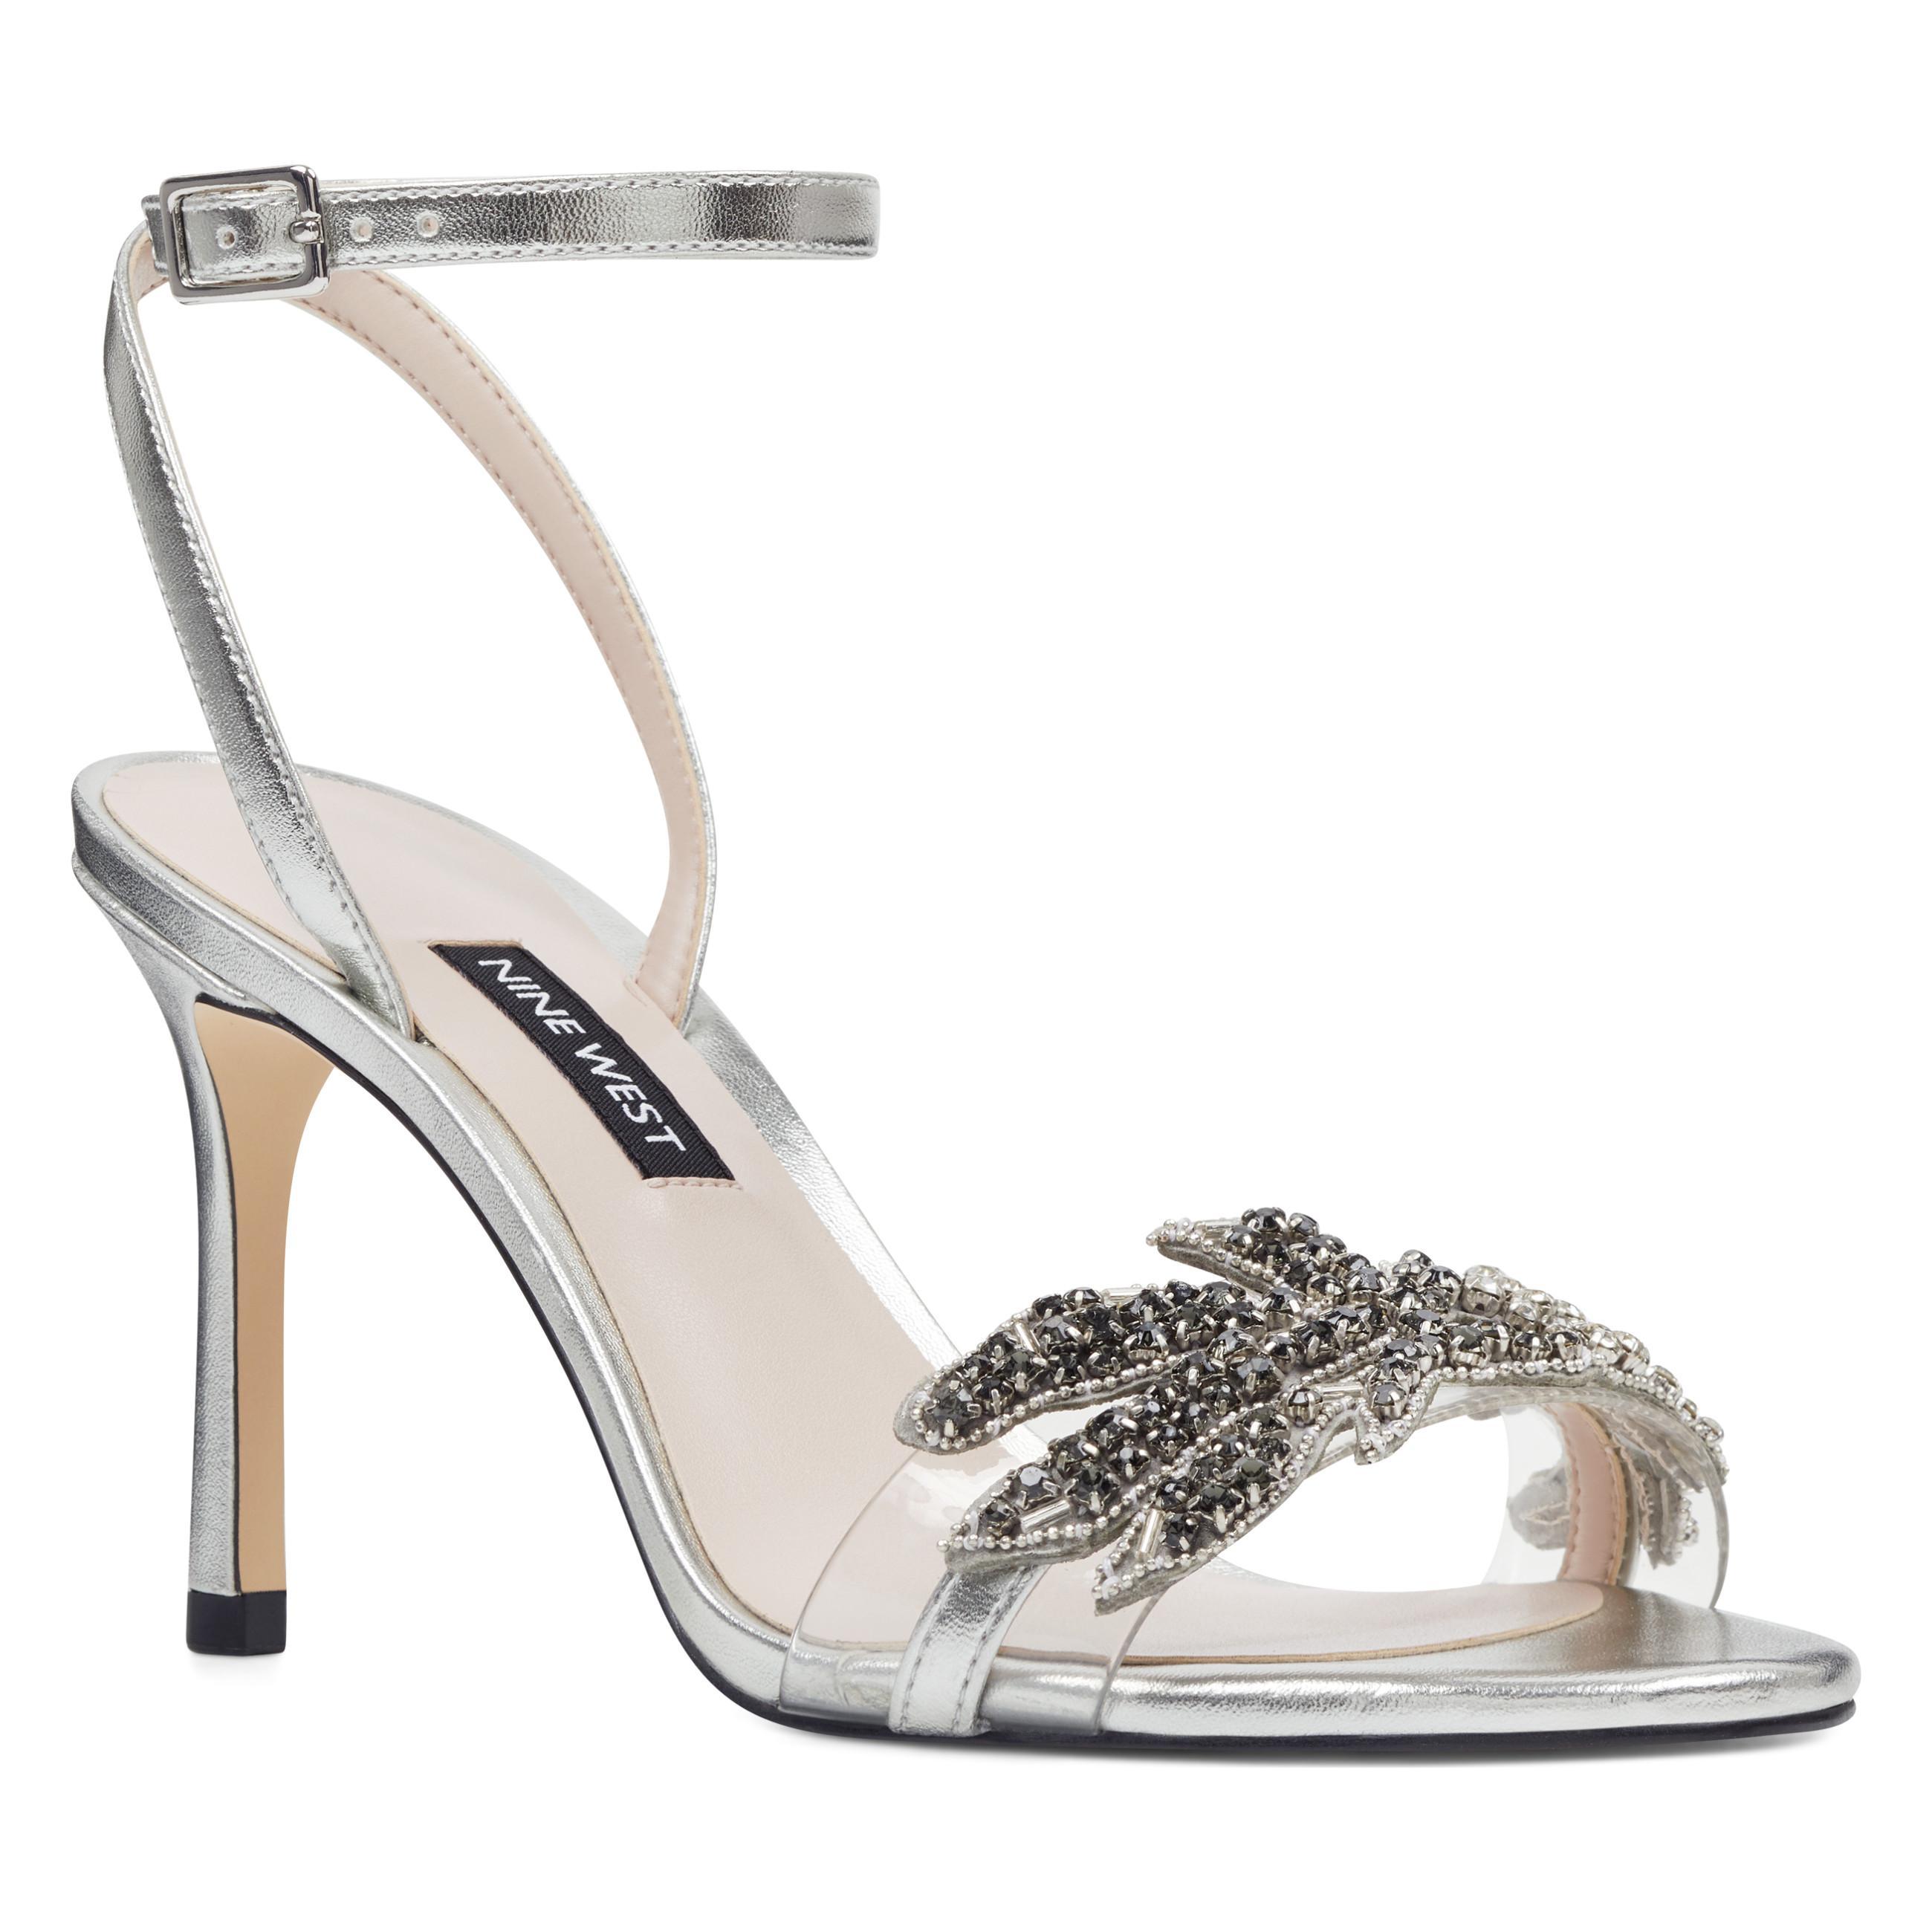 5929a5518635a9 Nine West - Metallic Jamielee Embellished Sandals - Lyst. View fullscreen